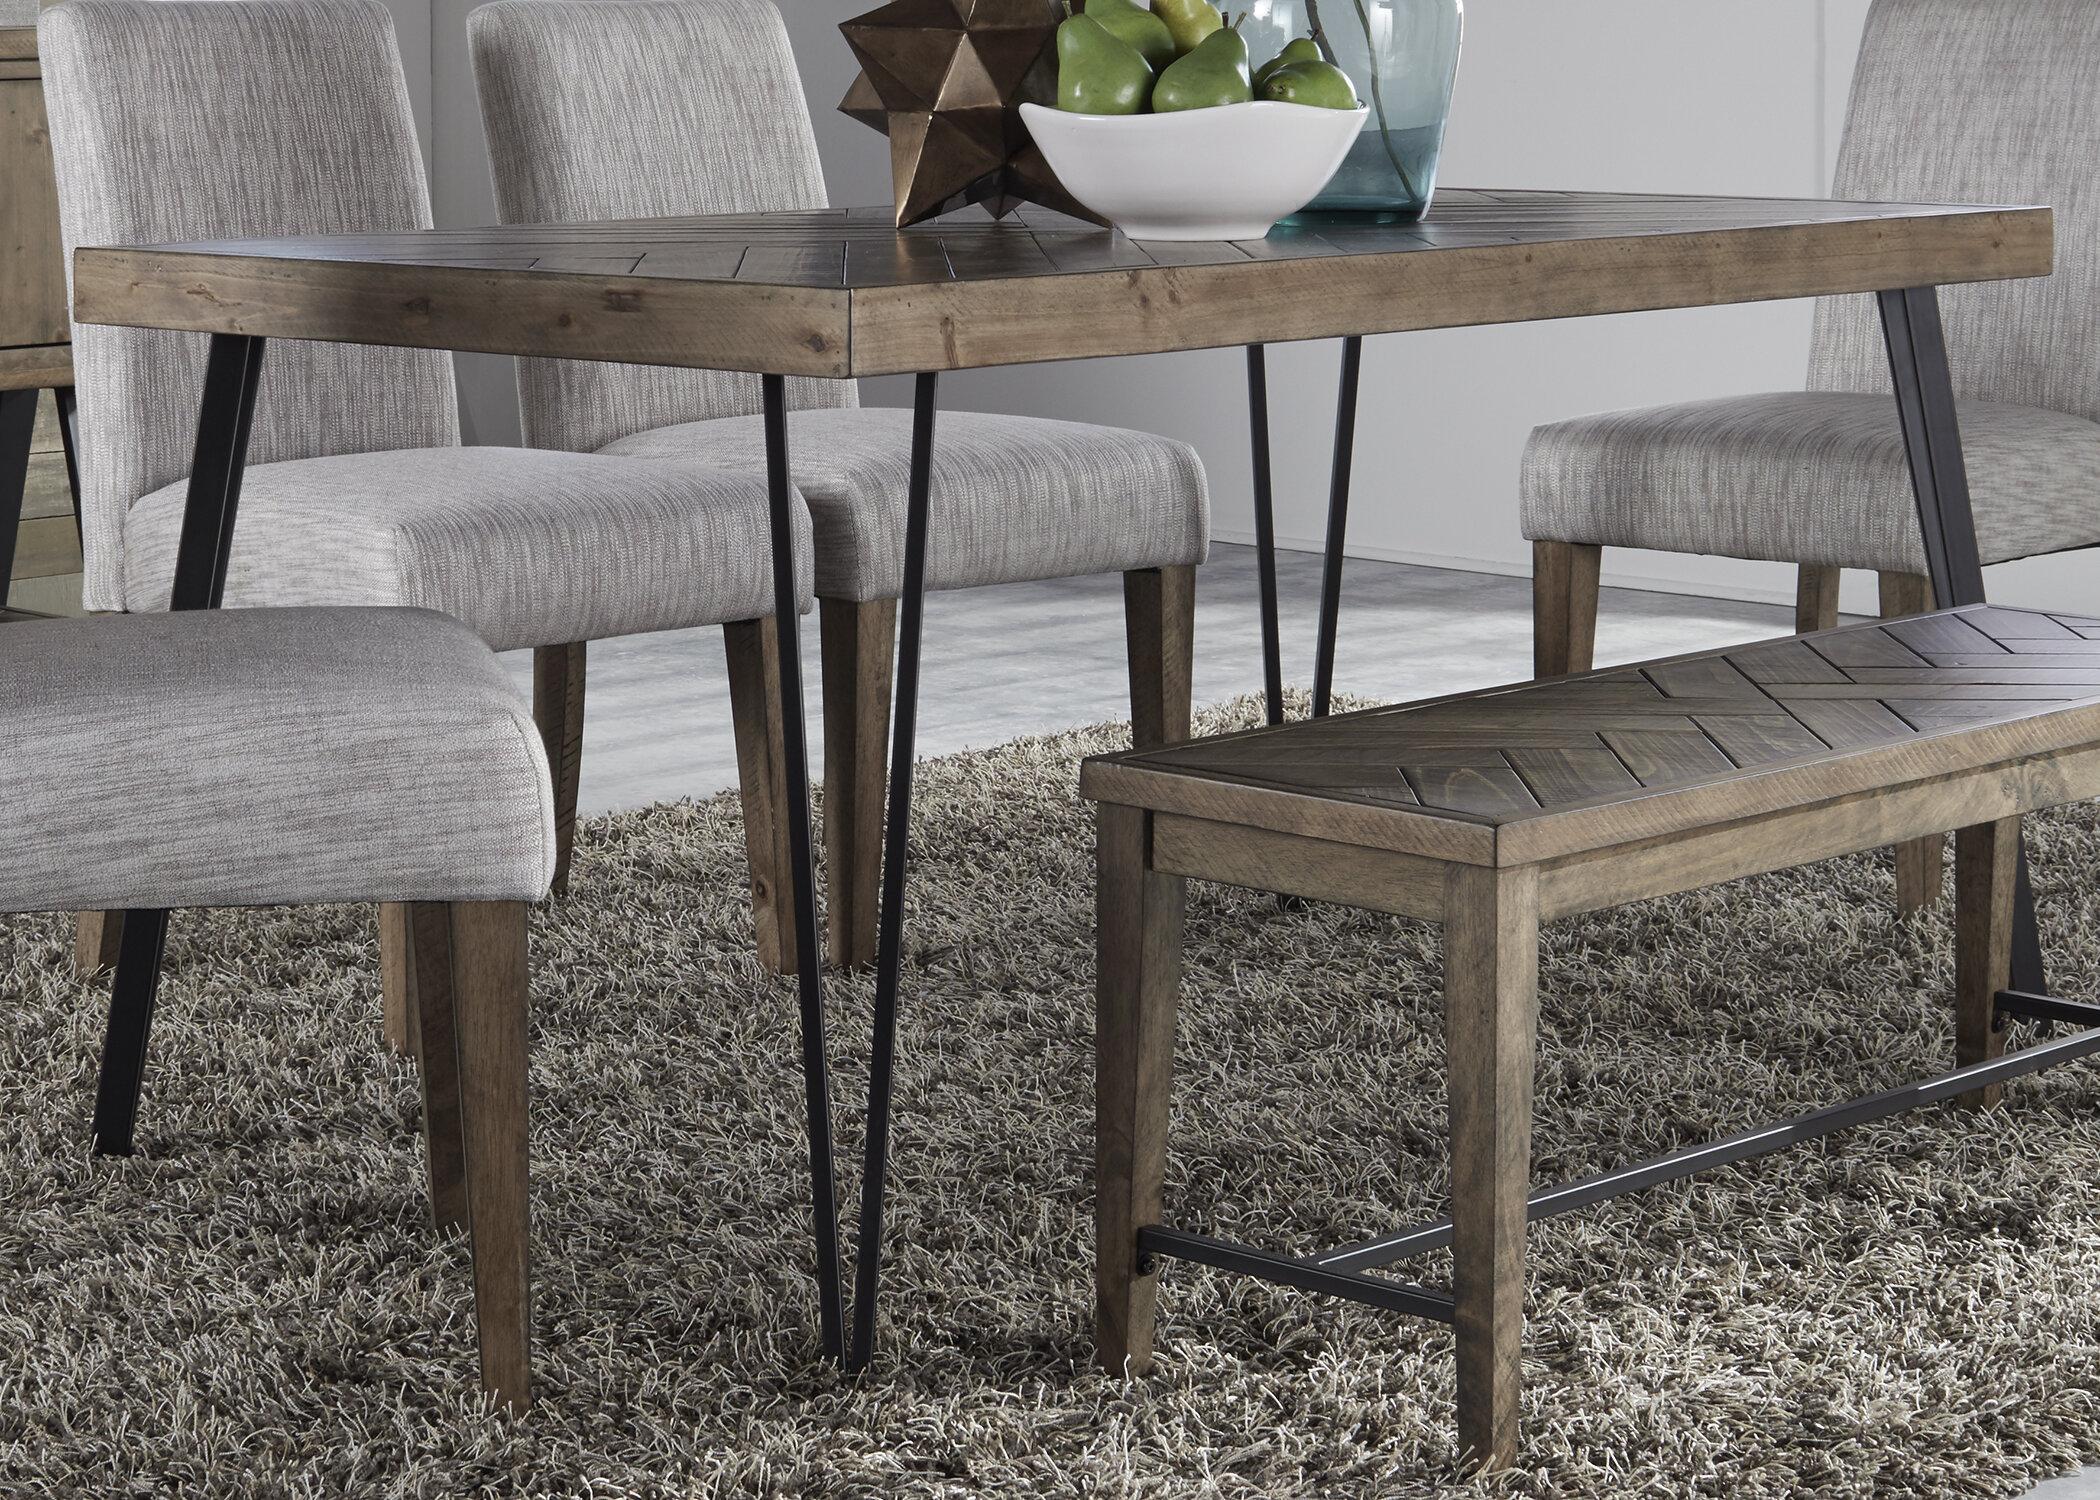 Stupendous Cleasby 6 Piece Dining Set Creativecarmelina Interior Chair Design Creativecarmelinacom